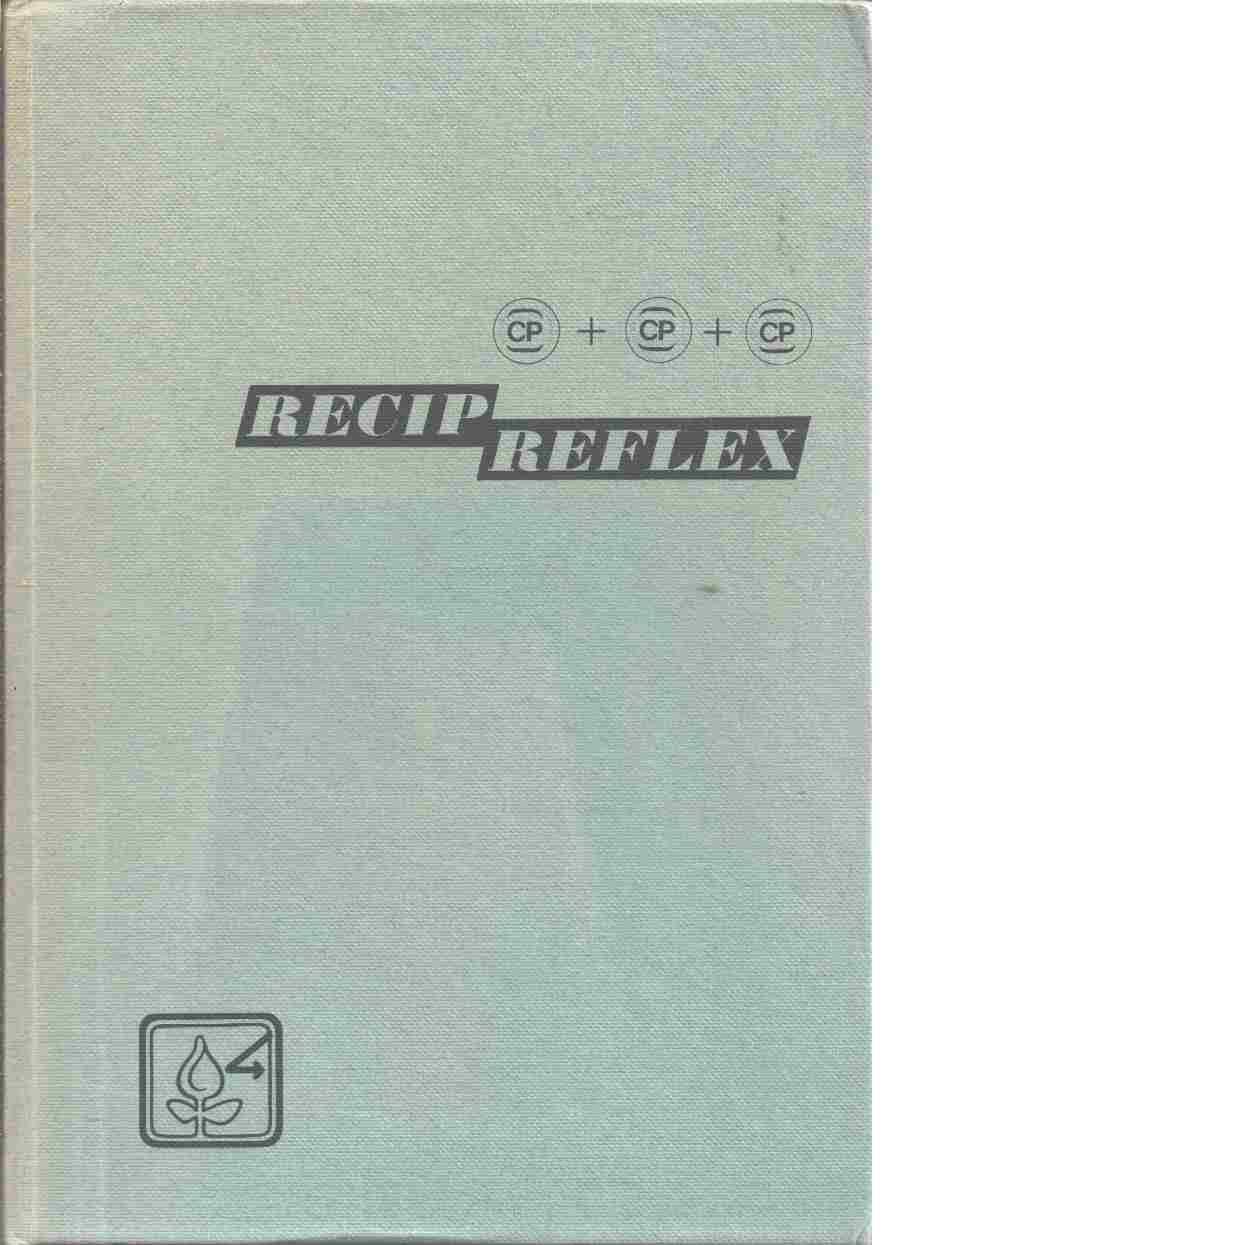 Recip reflex - Red. Recip